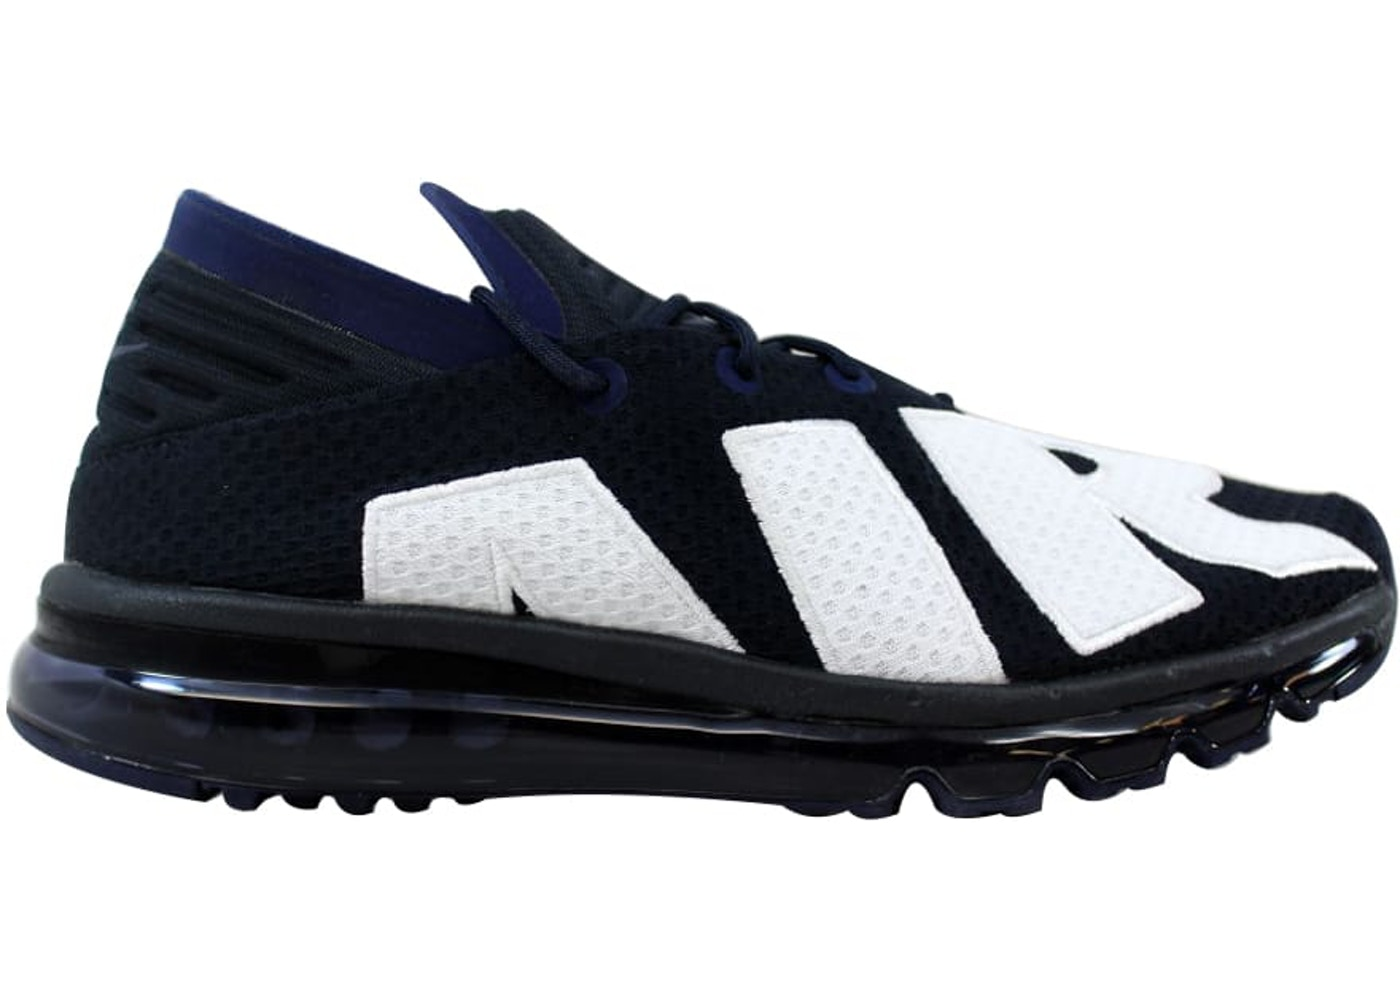 31e1938d7e2c Sell. or Ask. Size  9.5. View All Bids. Nike Air Max Flair Dark Obsidian  White